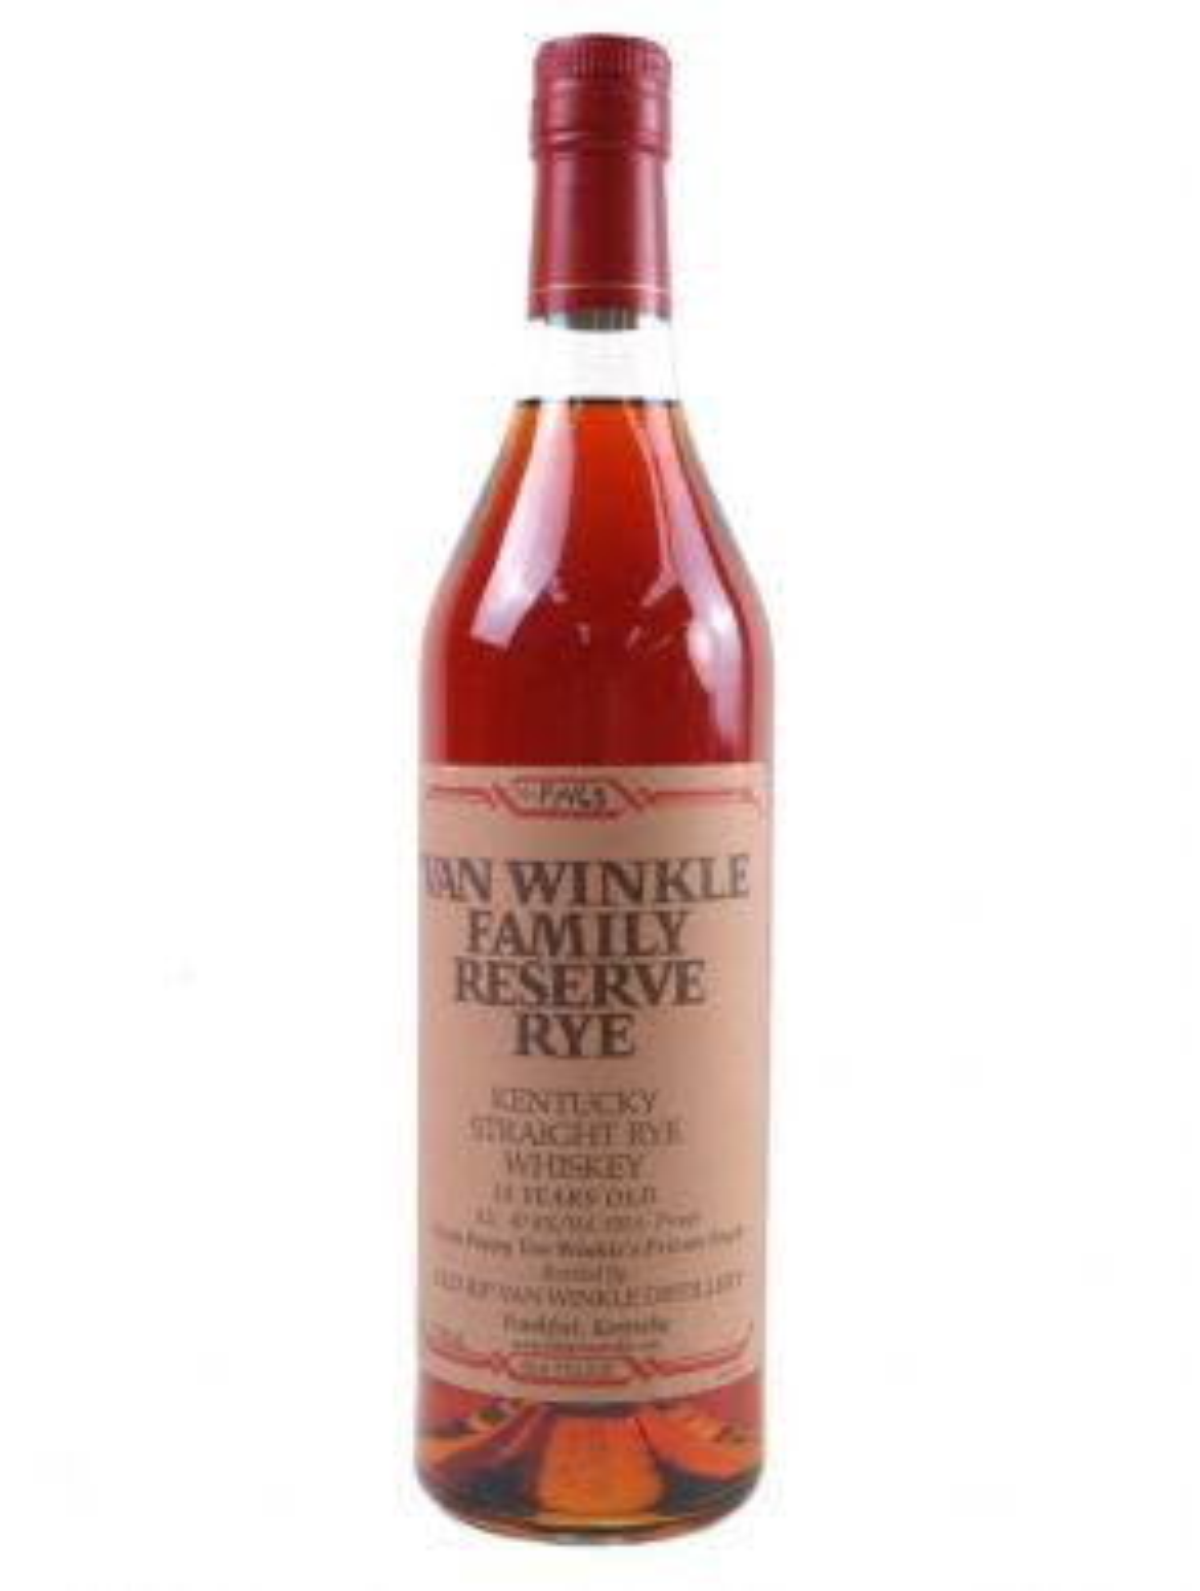 Van Winkle 13 Year Old Family Reserve Rye 70cl